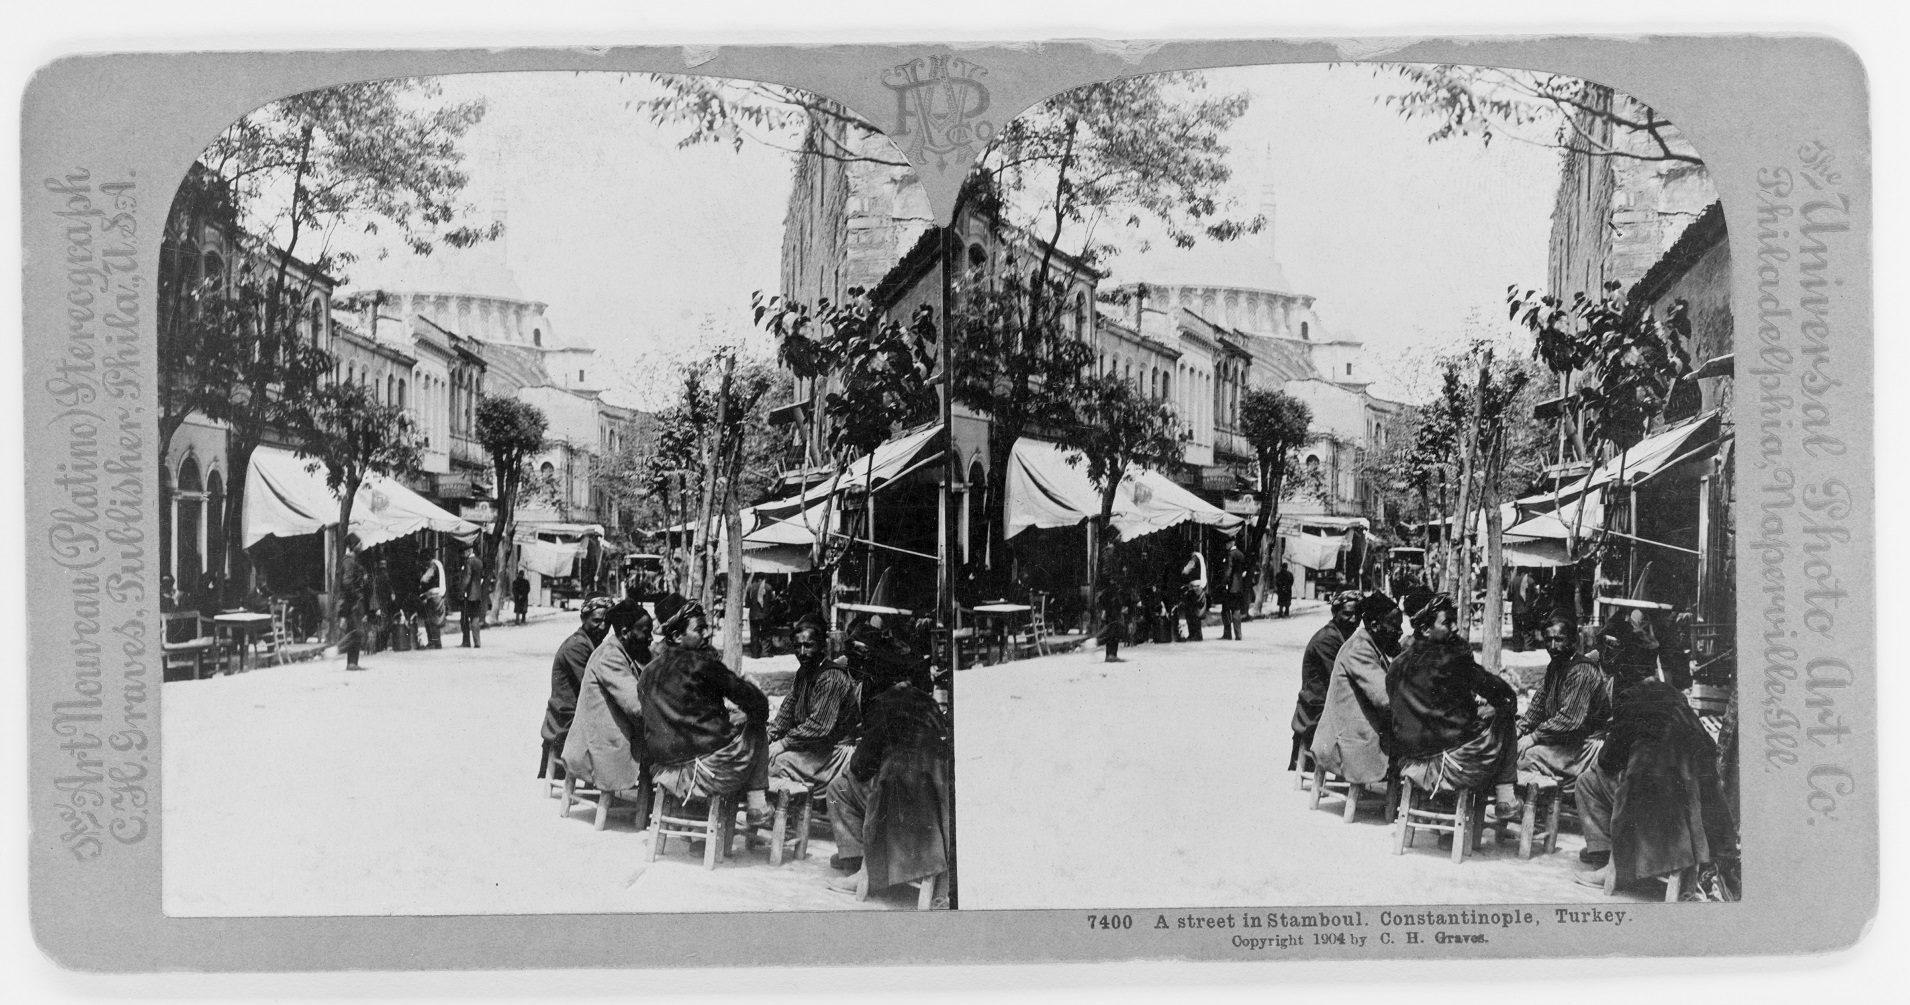 A street in Stamboul, Constantinople of Edmondo De Amicis